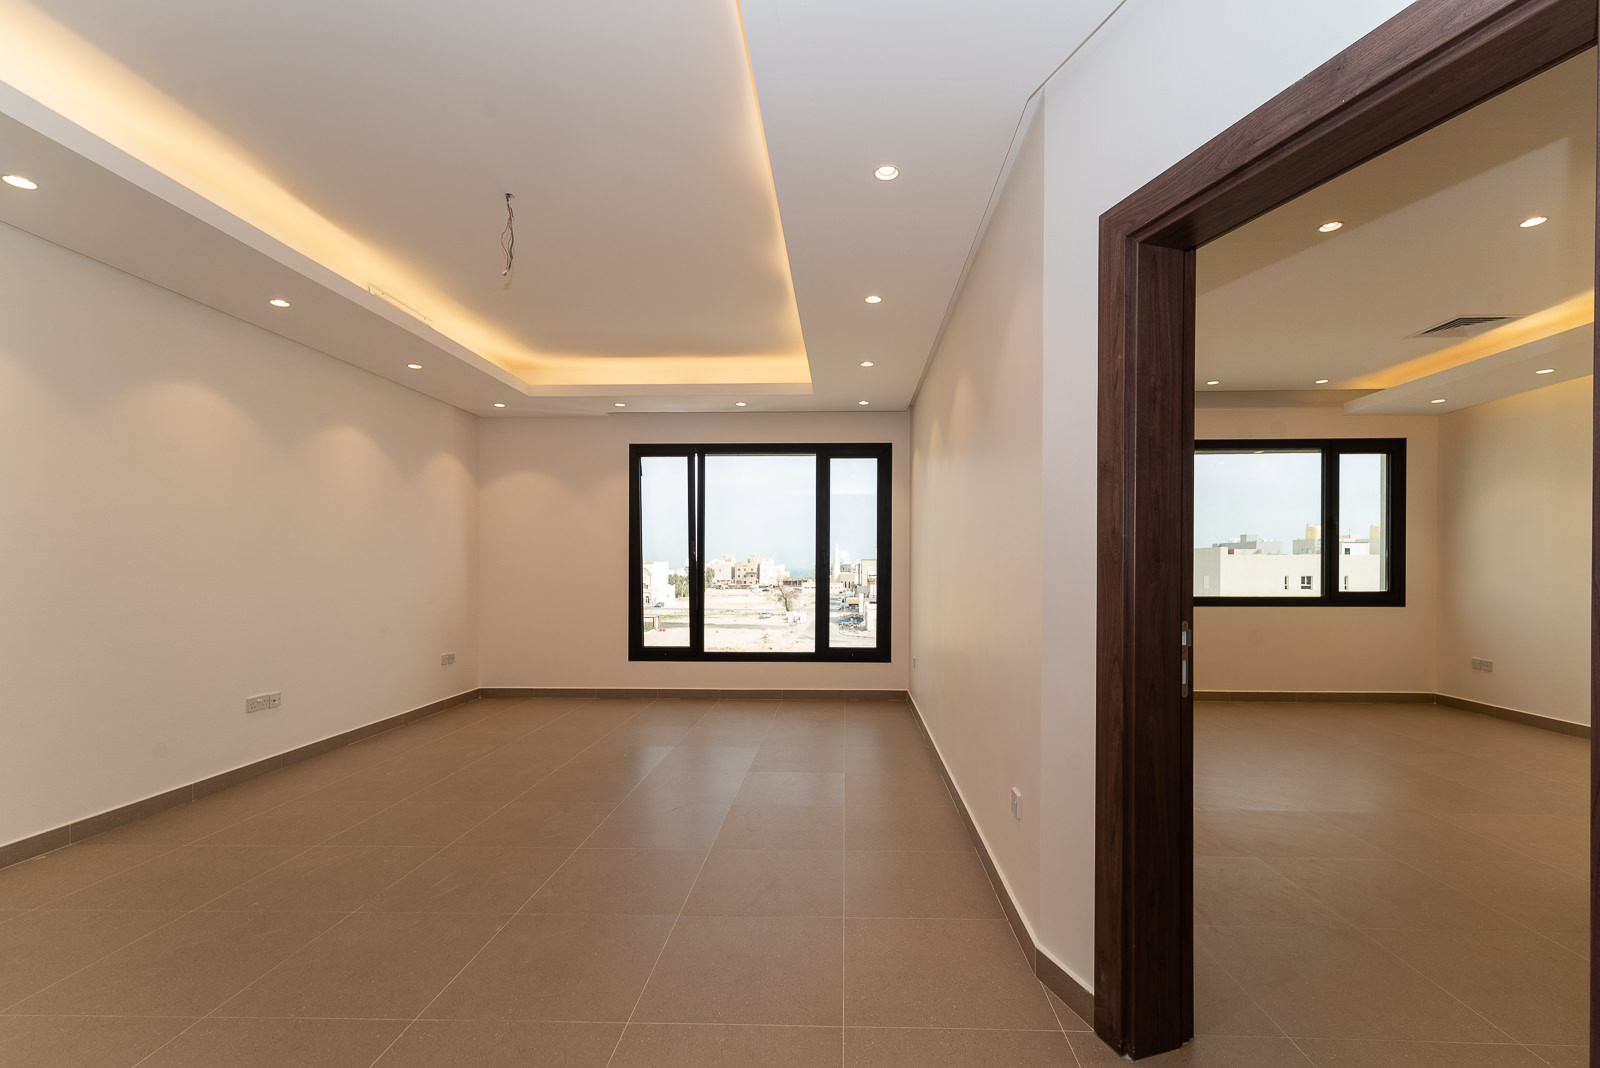 Fnaitees – great, spacious three bedroom apartment